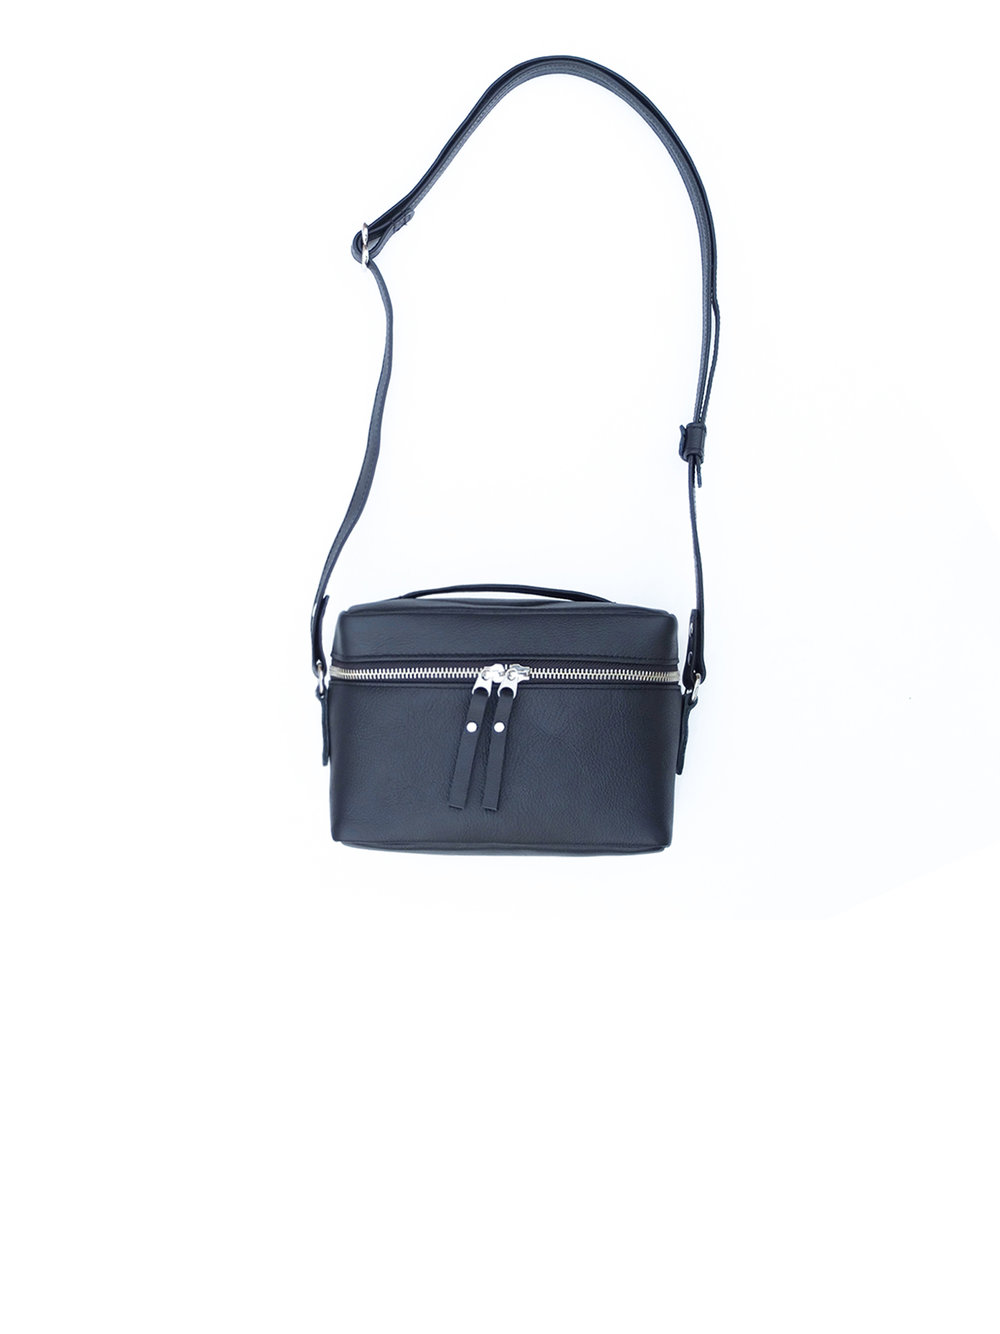 Box - Handbag - 140.00$